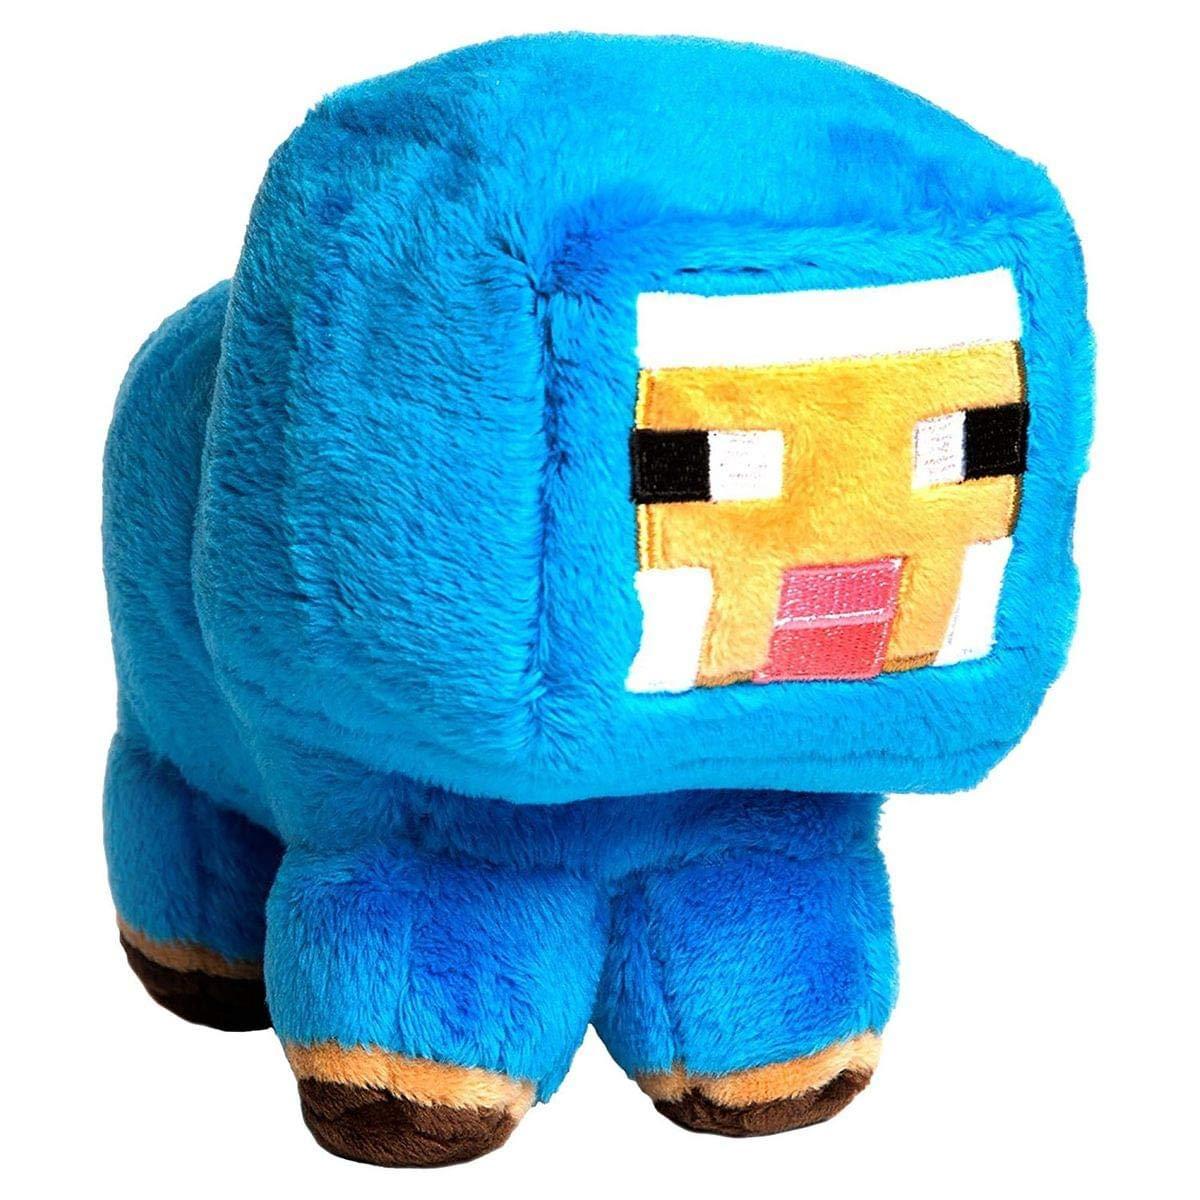 Minecraft 7184 Mouton en Peluche, Bleu, 17,8 cm 8cm Jinx